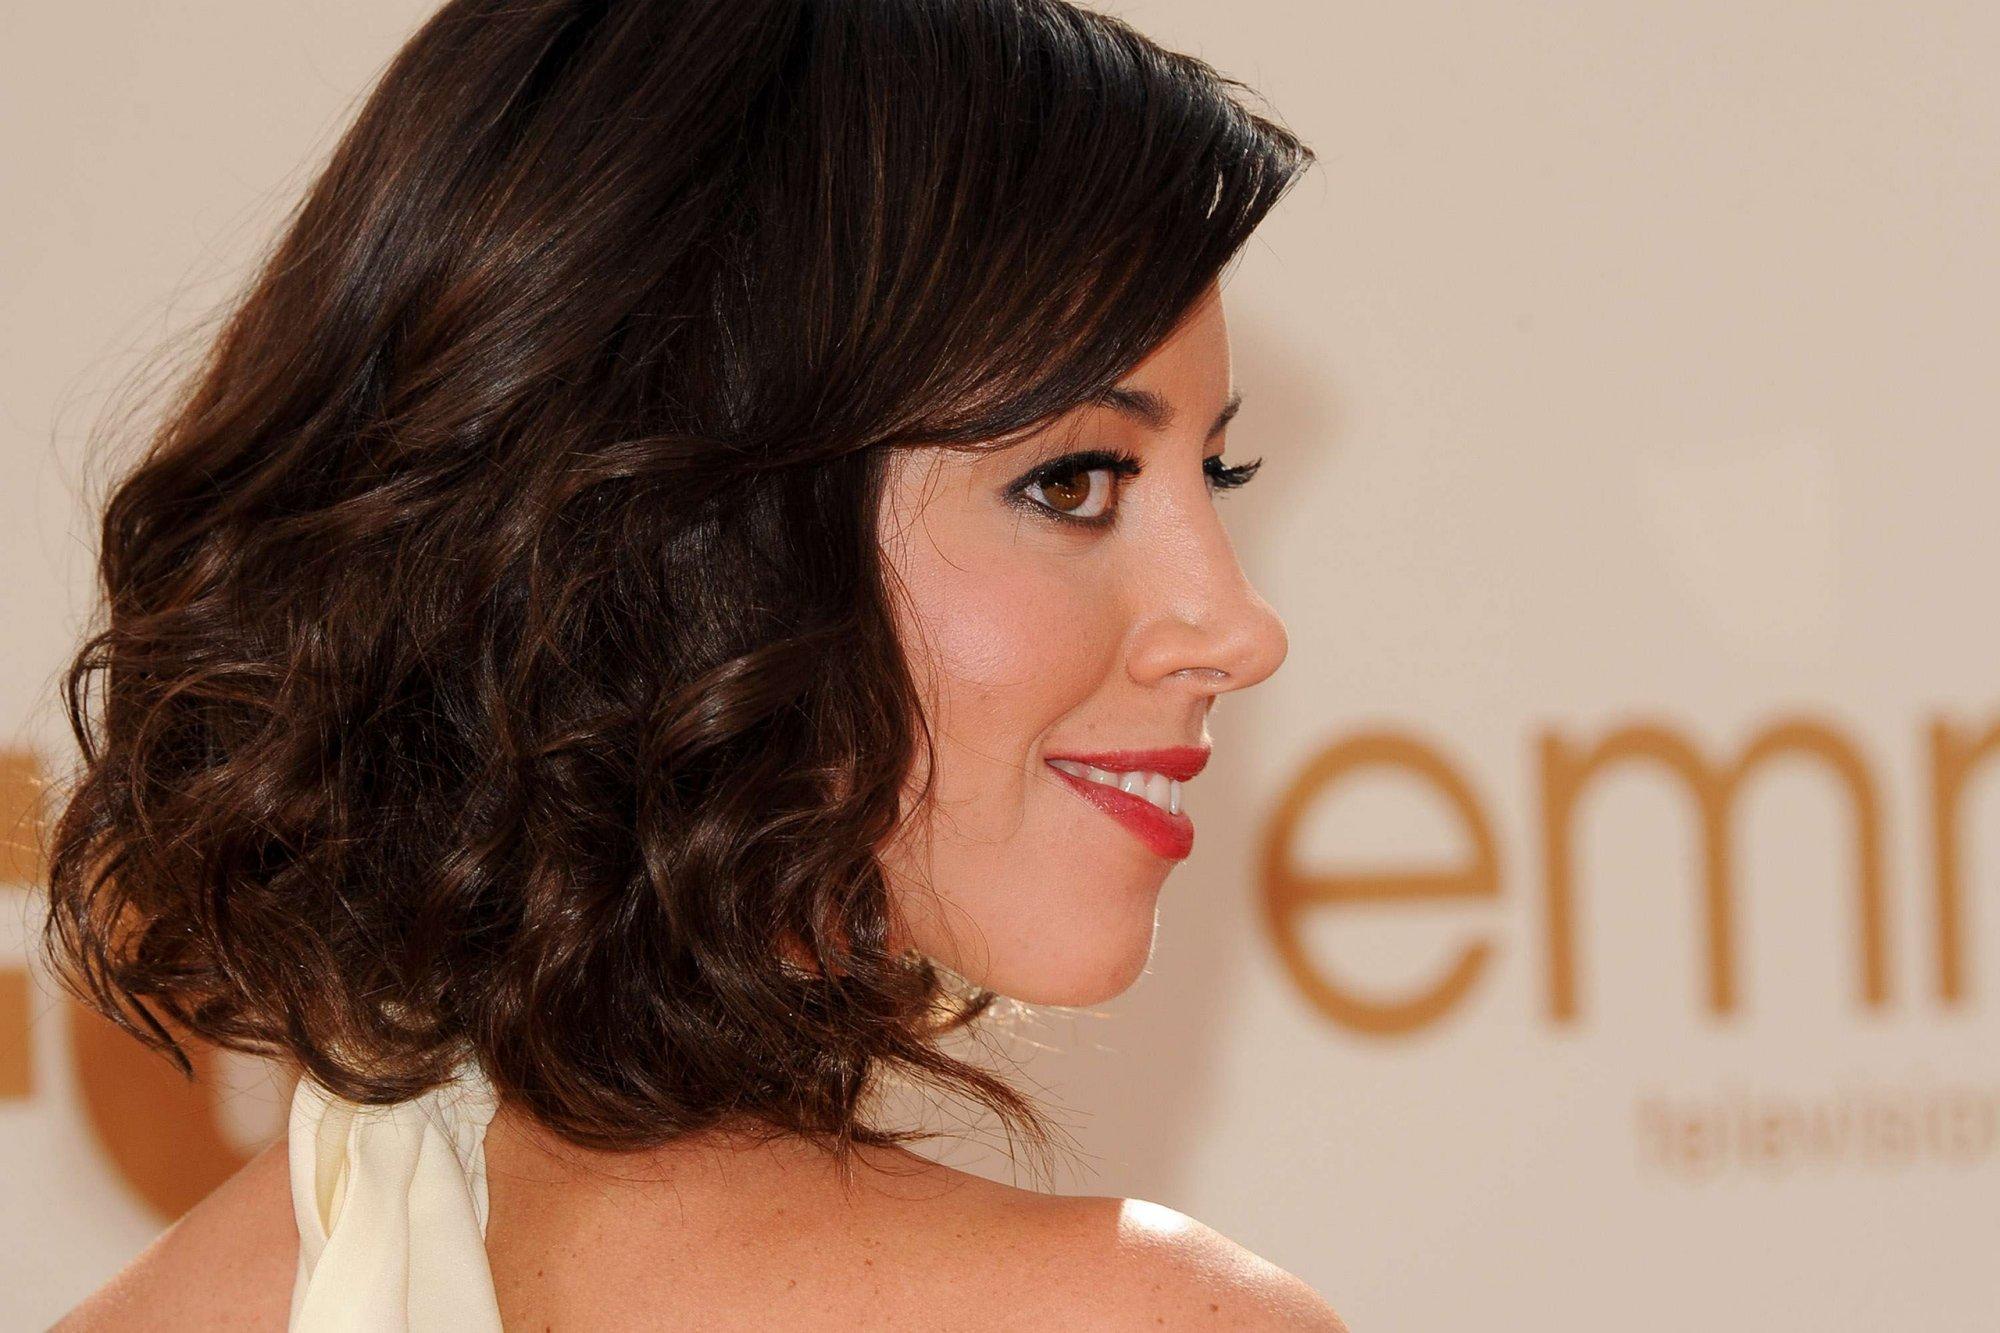 Wallpaper Face Model Long Hair Makeup Profile Actress Black